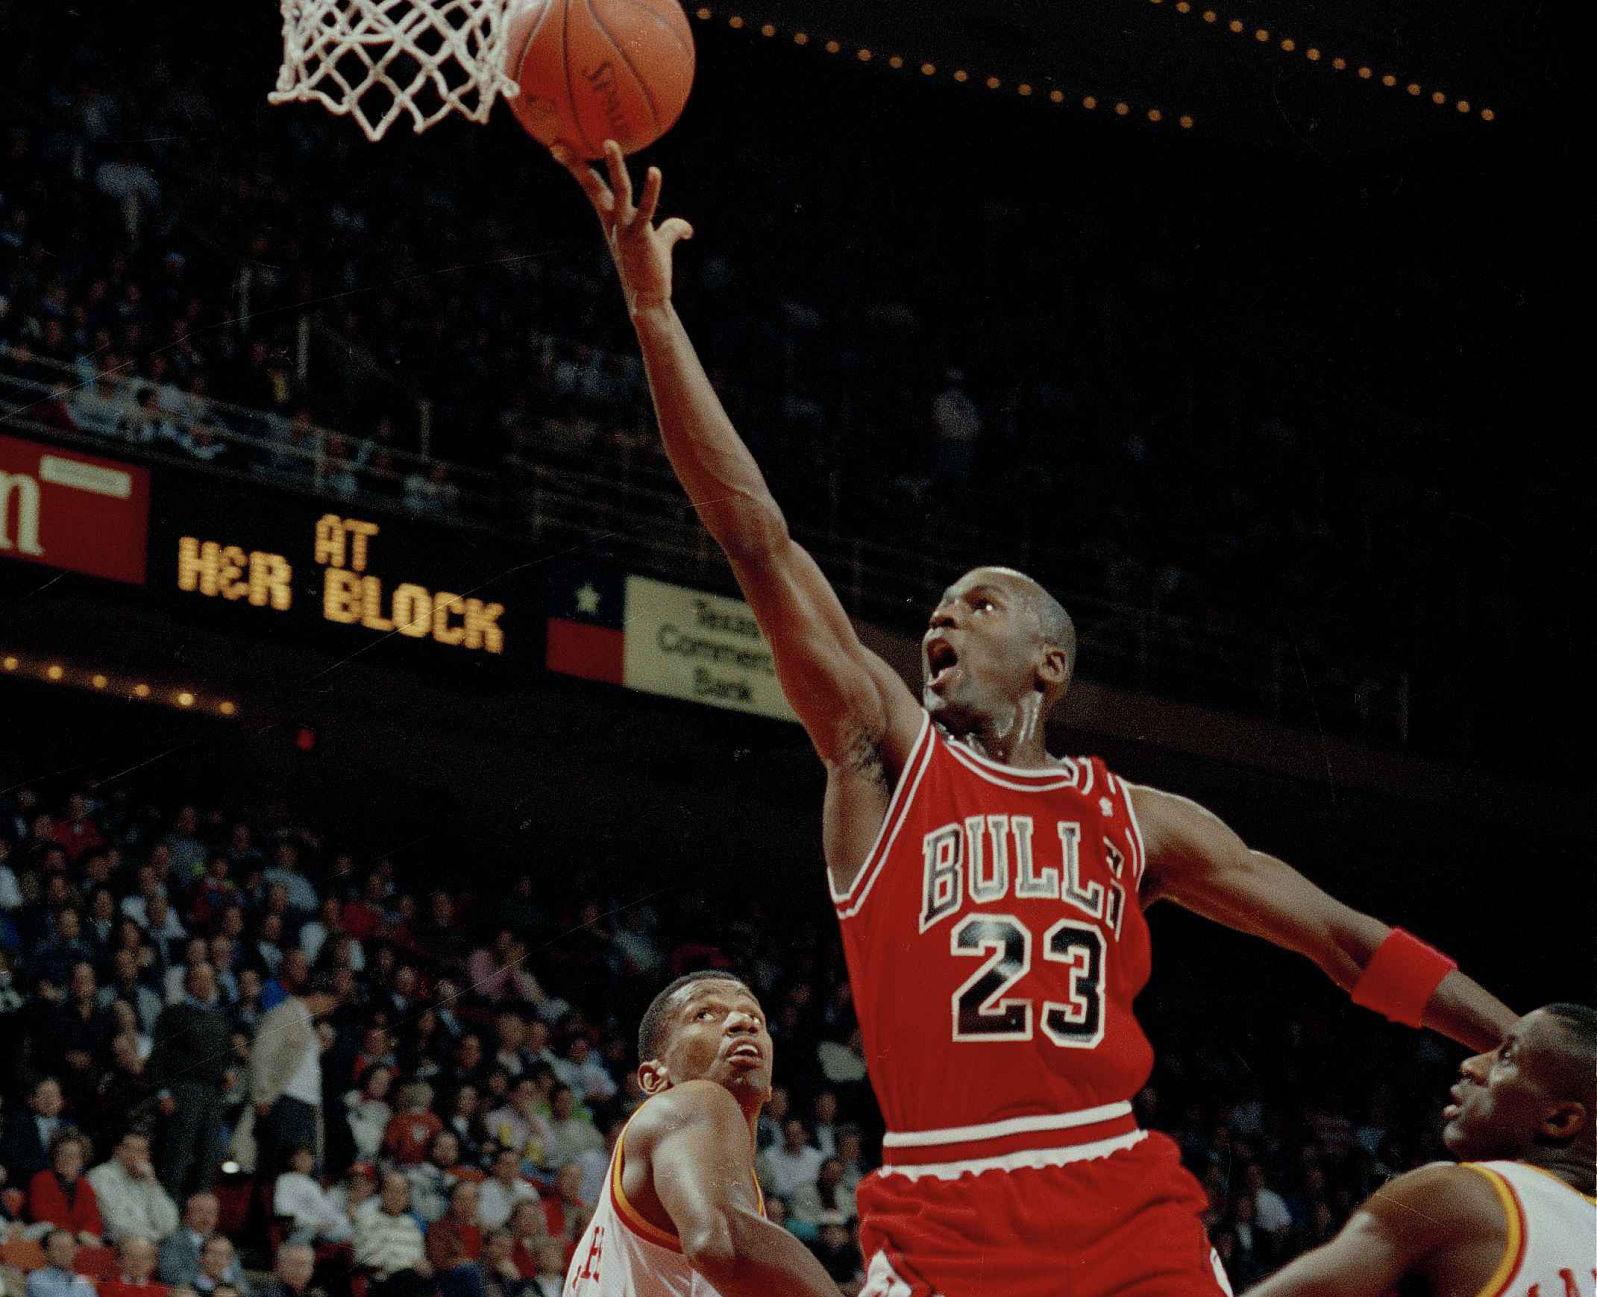 Legendary basketball player Michael Jordan bought a mansion in North Carolina 98